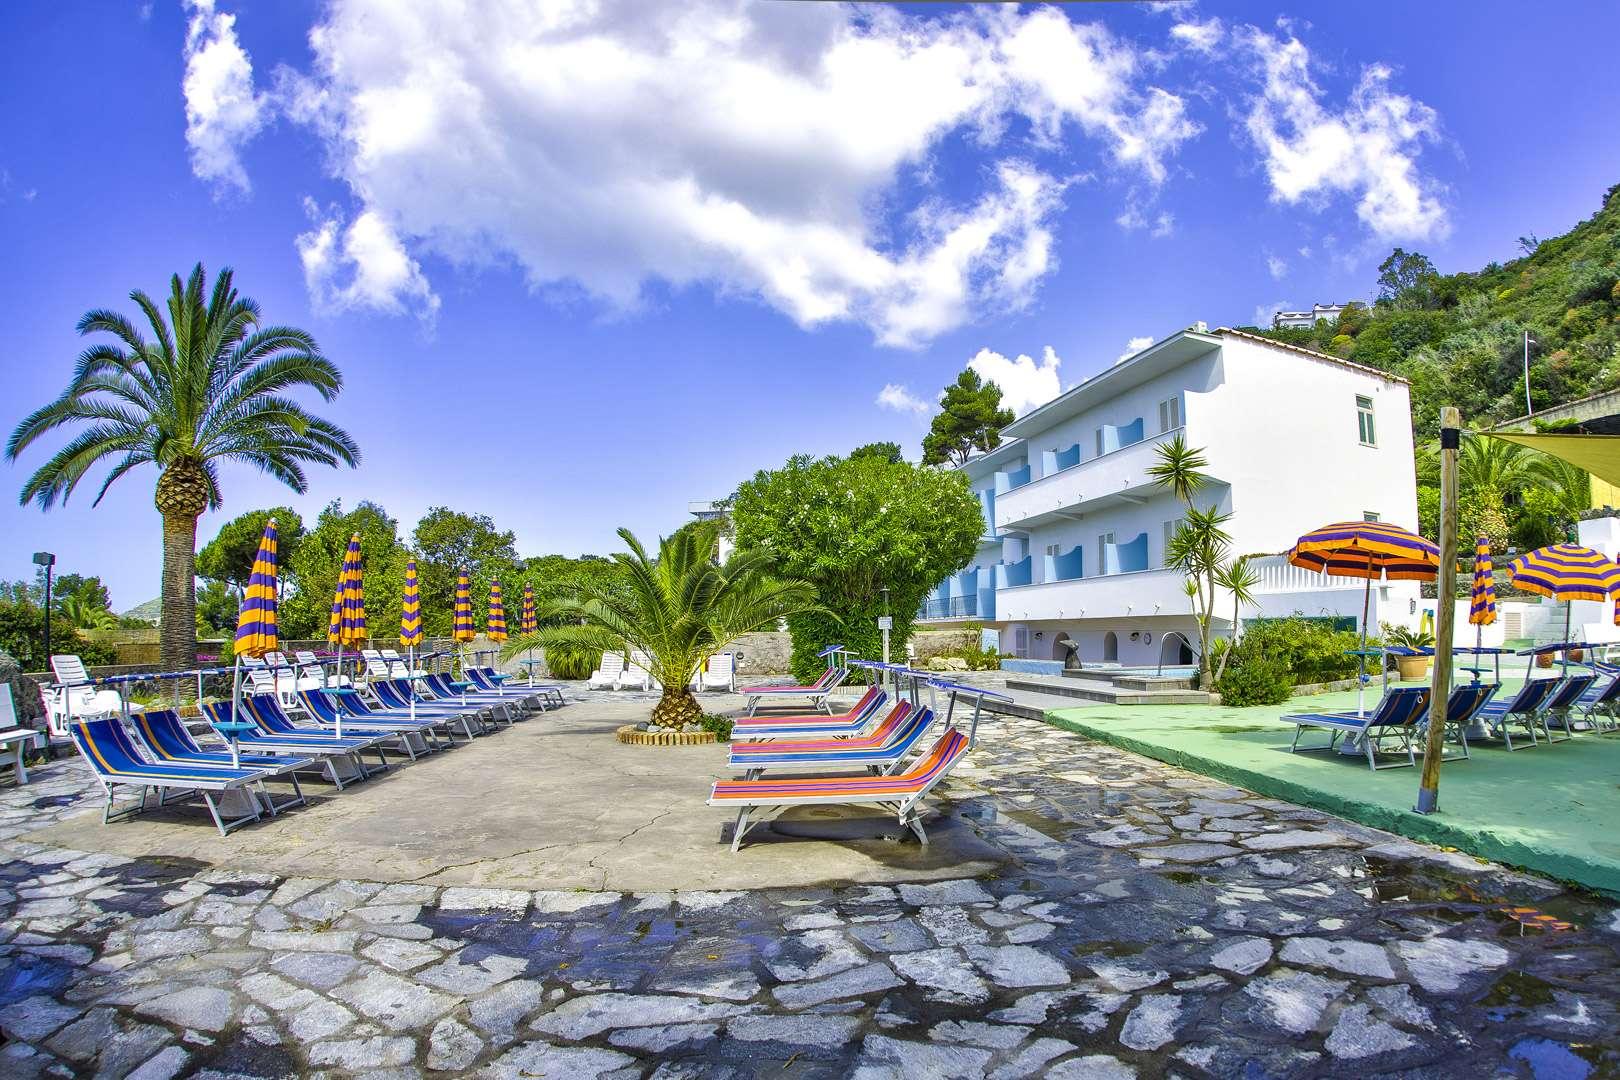 Hotel-Ischia-La-Mandorla-Struttura-01-1620x1080